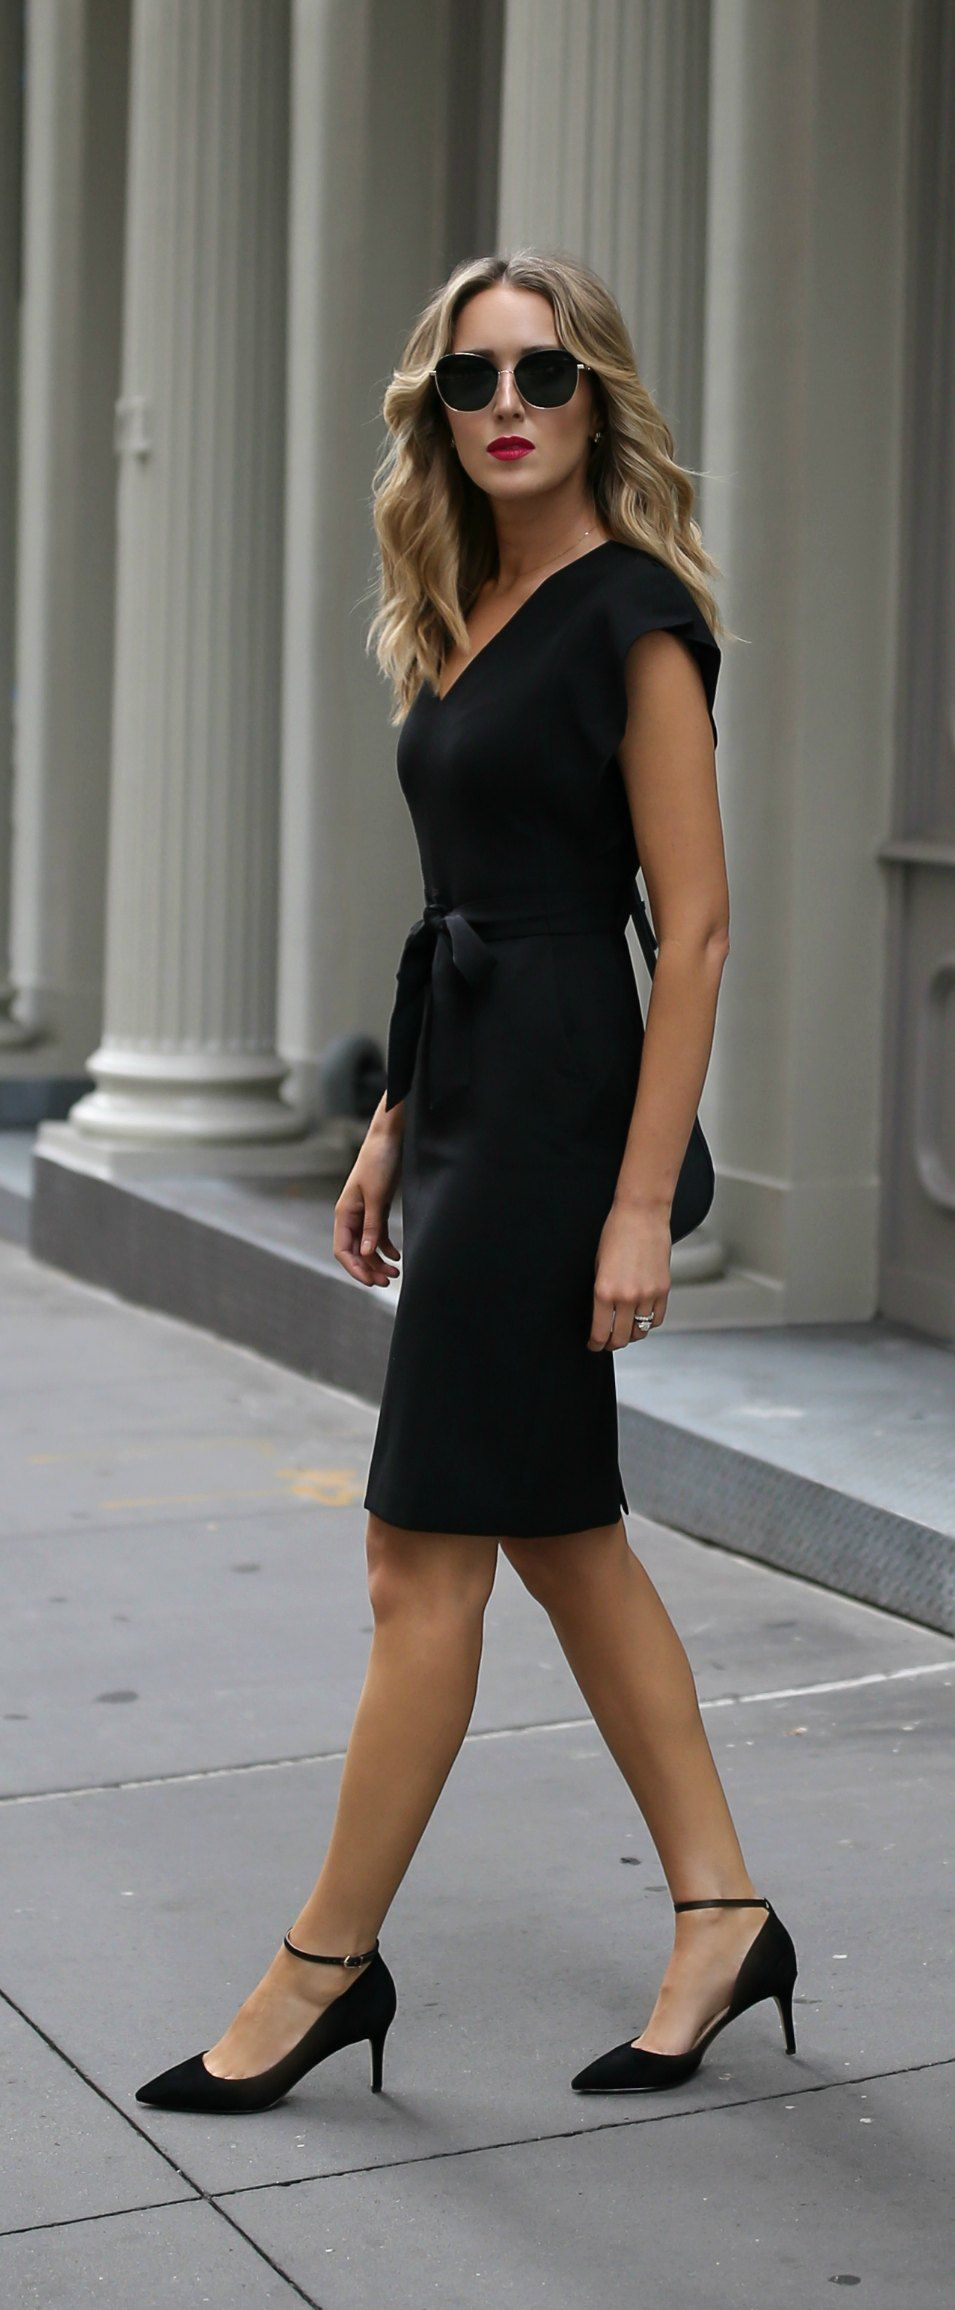 Classic Black Sheath Dress Ankle Strap Black Pumps Eliza J Sam Edelman Affordable Workwear Under Fashion Womens Fashion Casual Chic Fashion Clothes Women [ 2310 x 955 Pixel ]